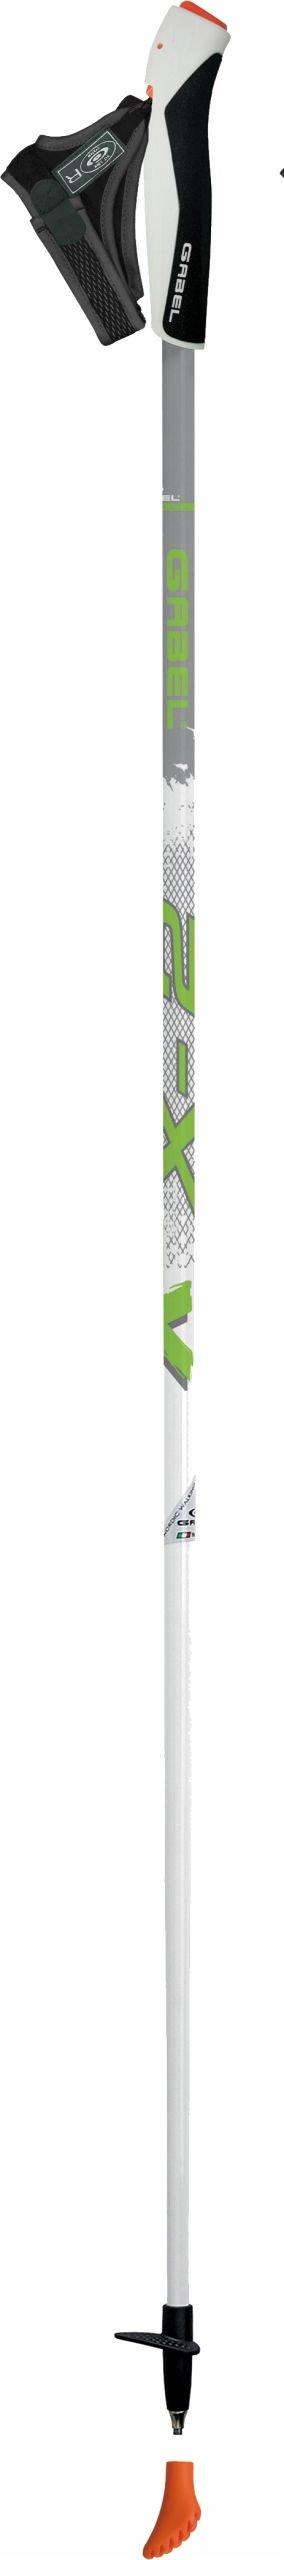 Gabel Kije trekkingowe X-2 Green 120 cm 7008361081200